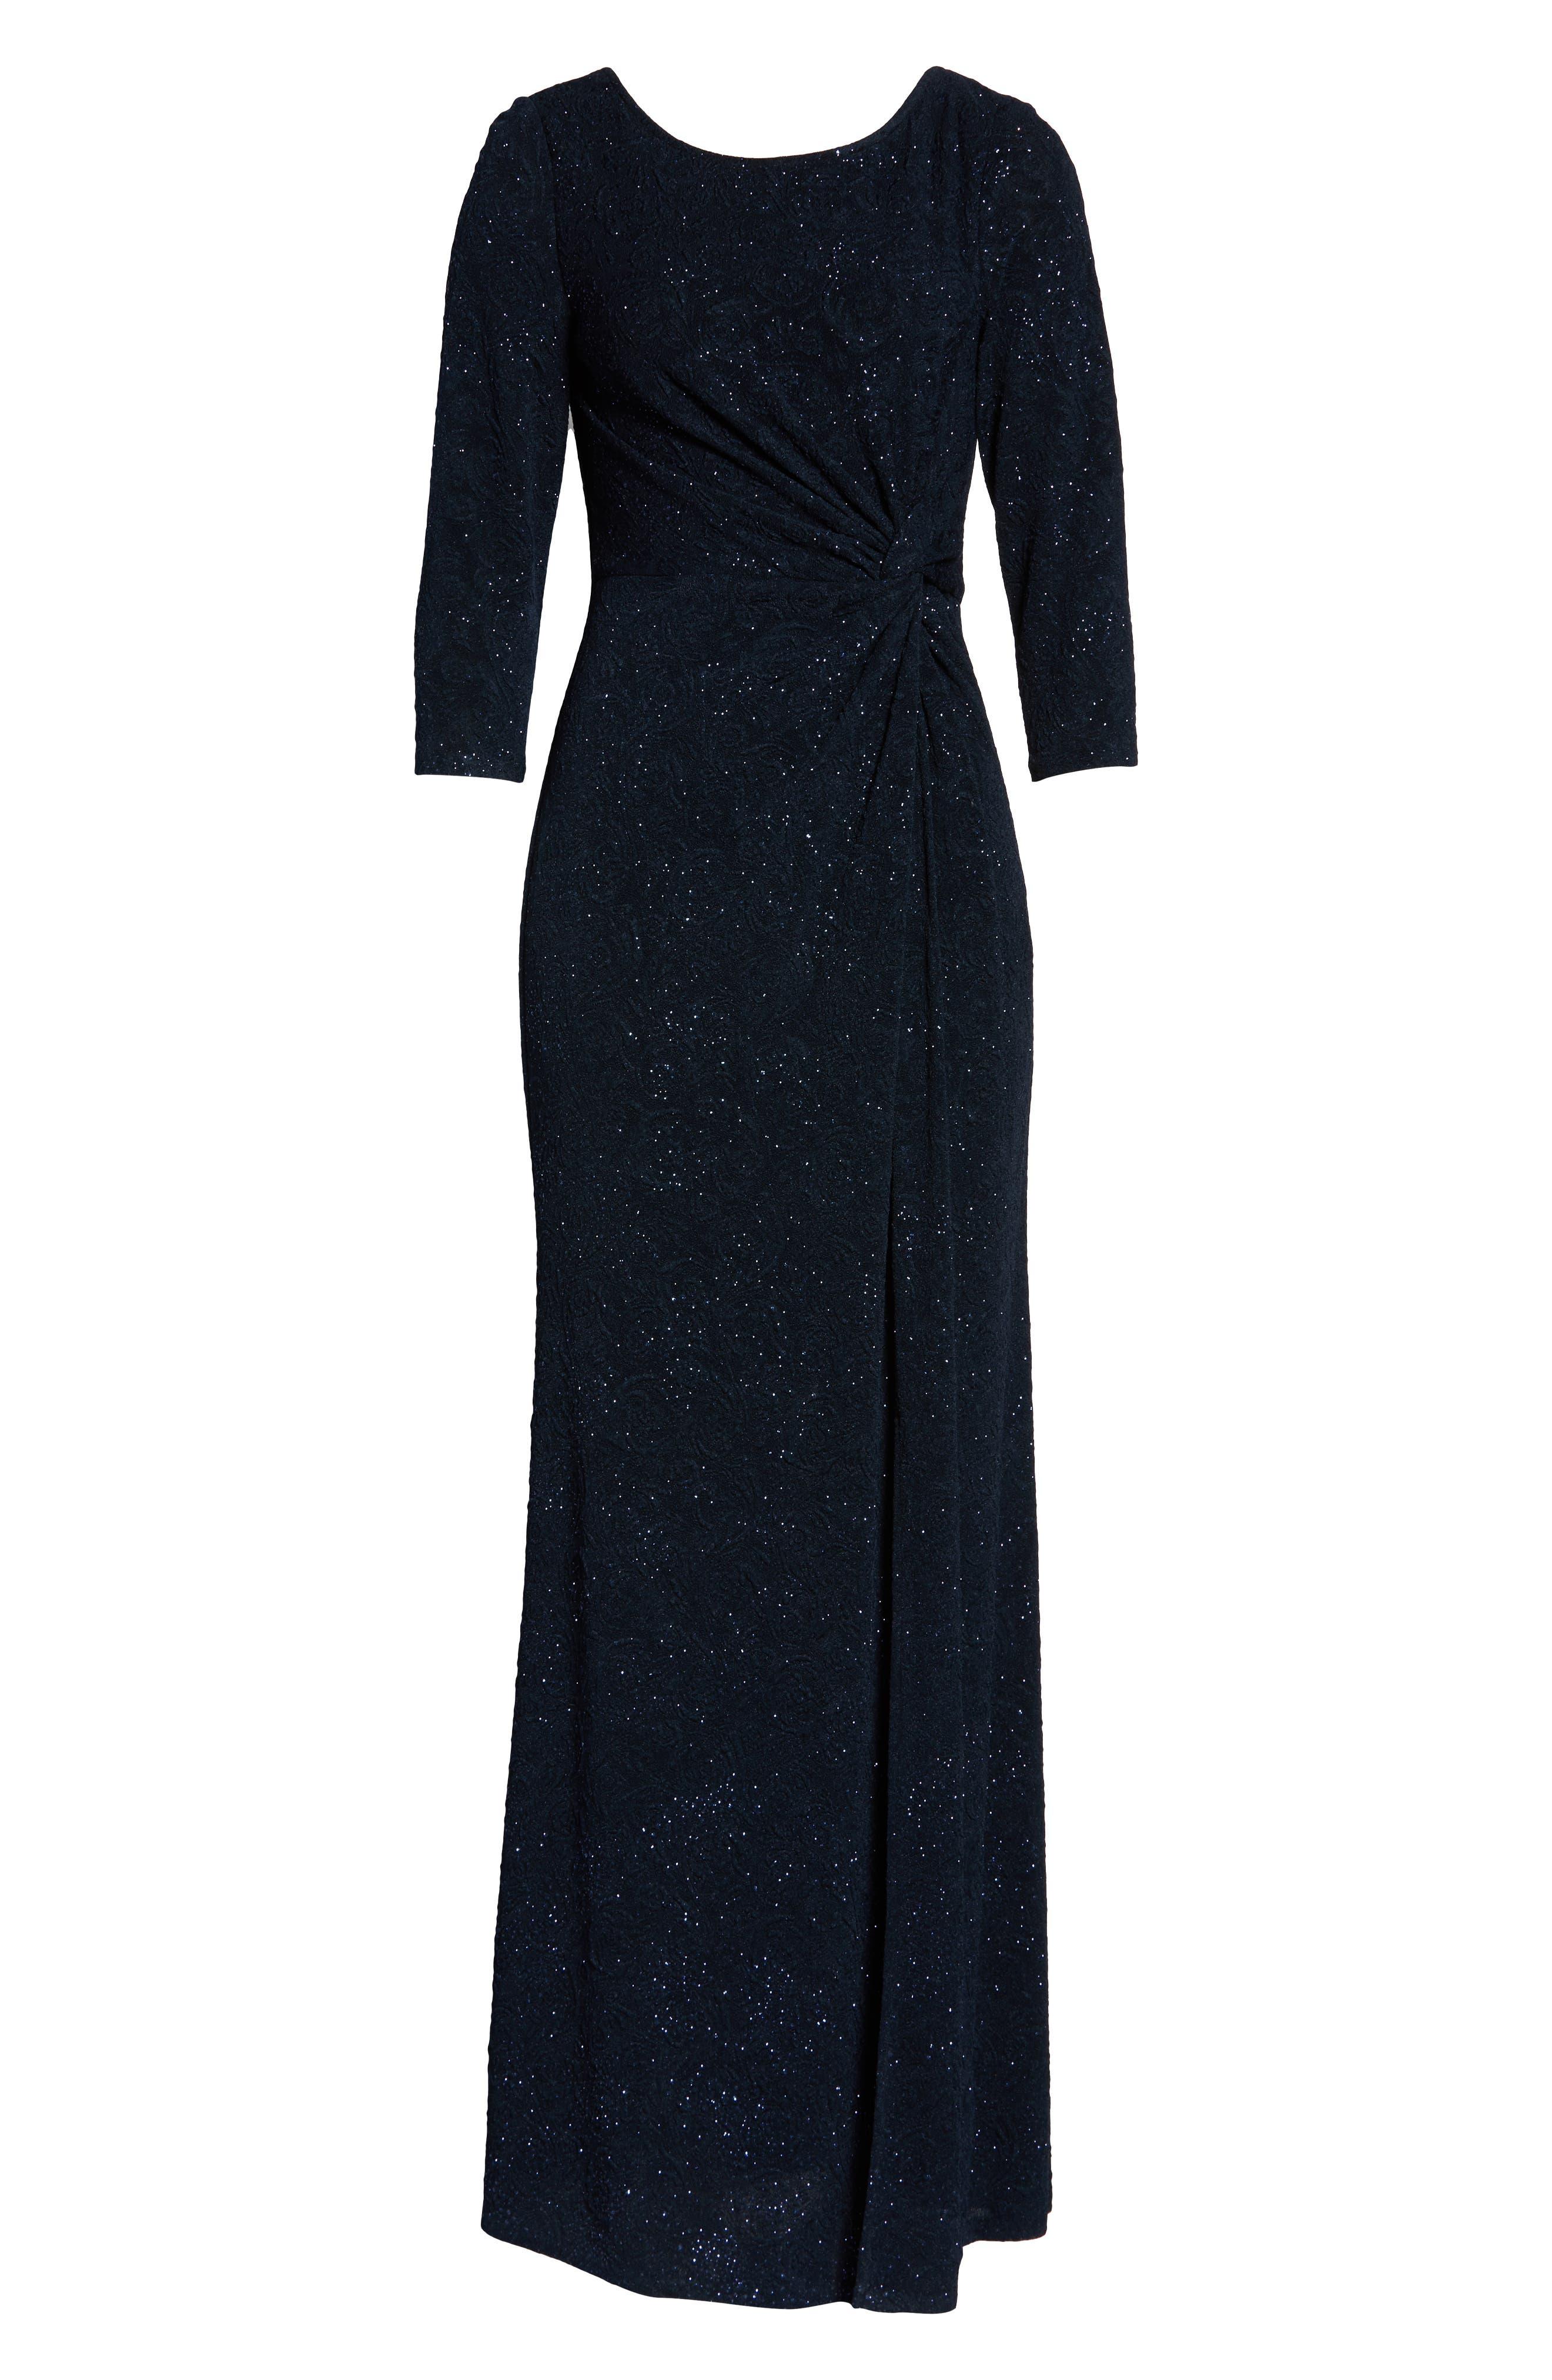 ALEX EVENINGS, Knot Front Sequin Jacquard Evening Dress, Alternate thumbnail 8, color, NAVY